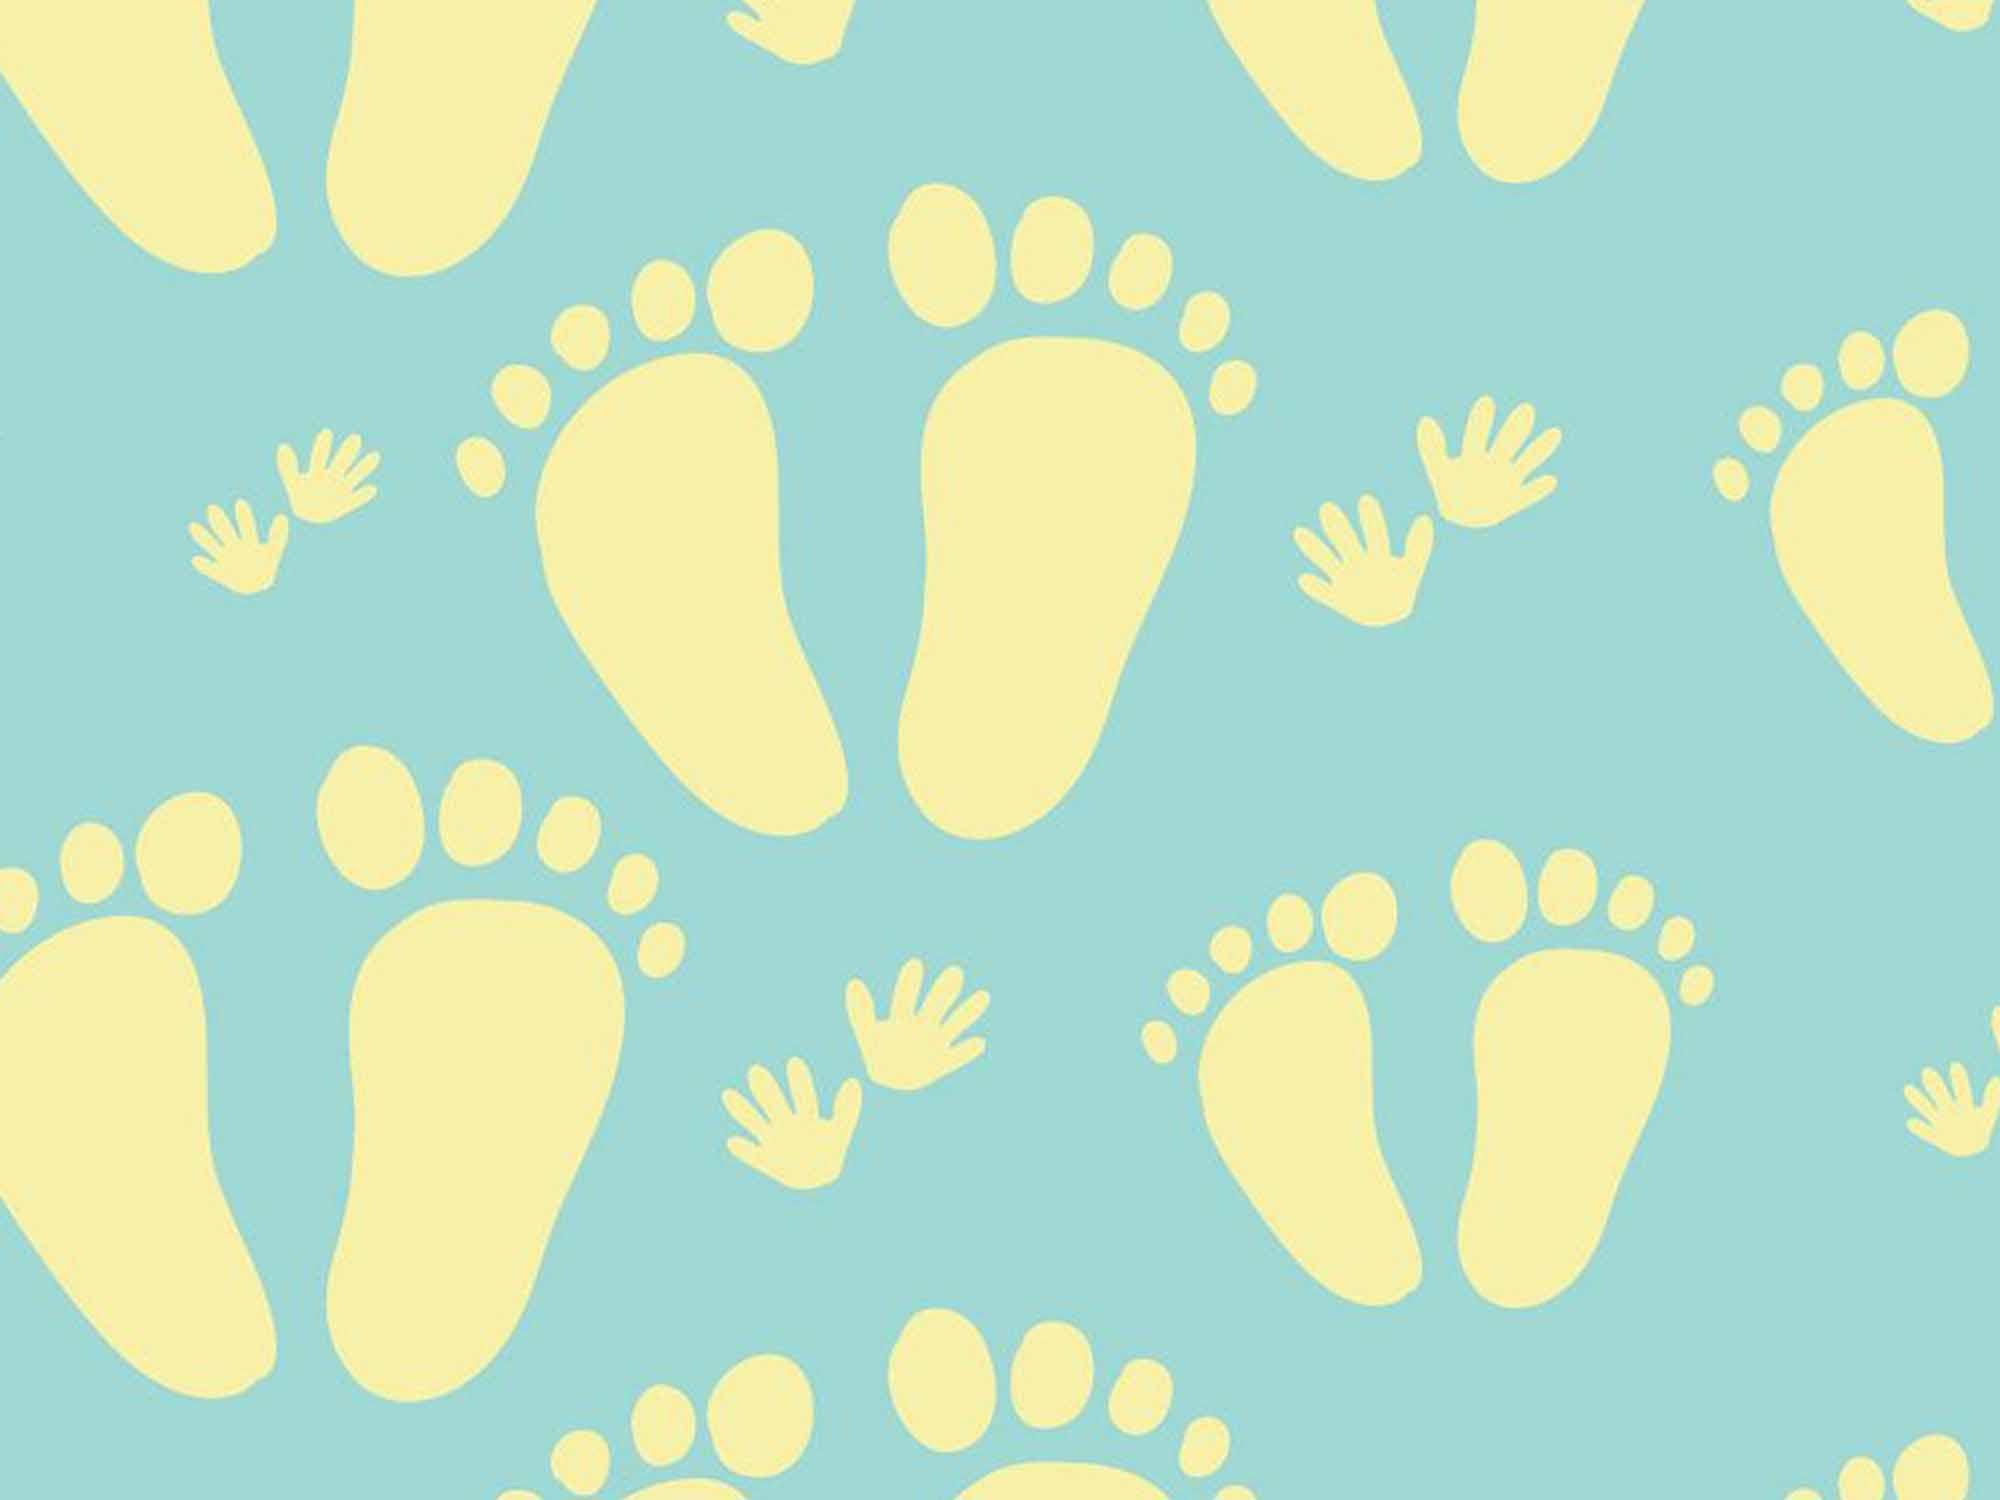 Papel de Parede Infantil 0042 - Adesivos de Parede  - Paredes Decoradas